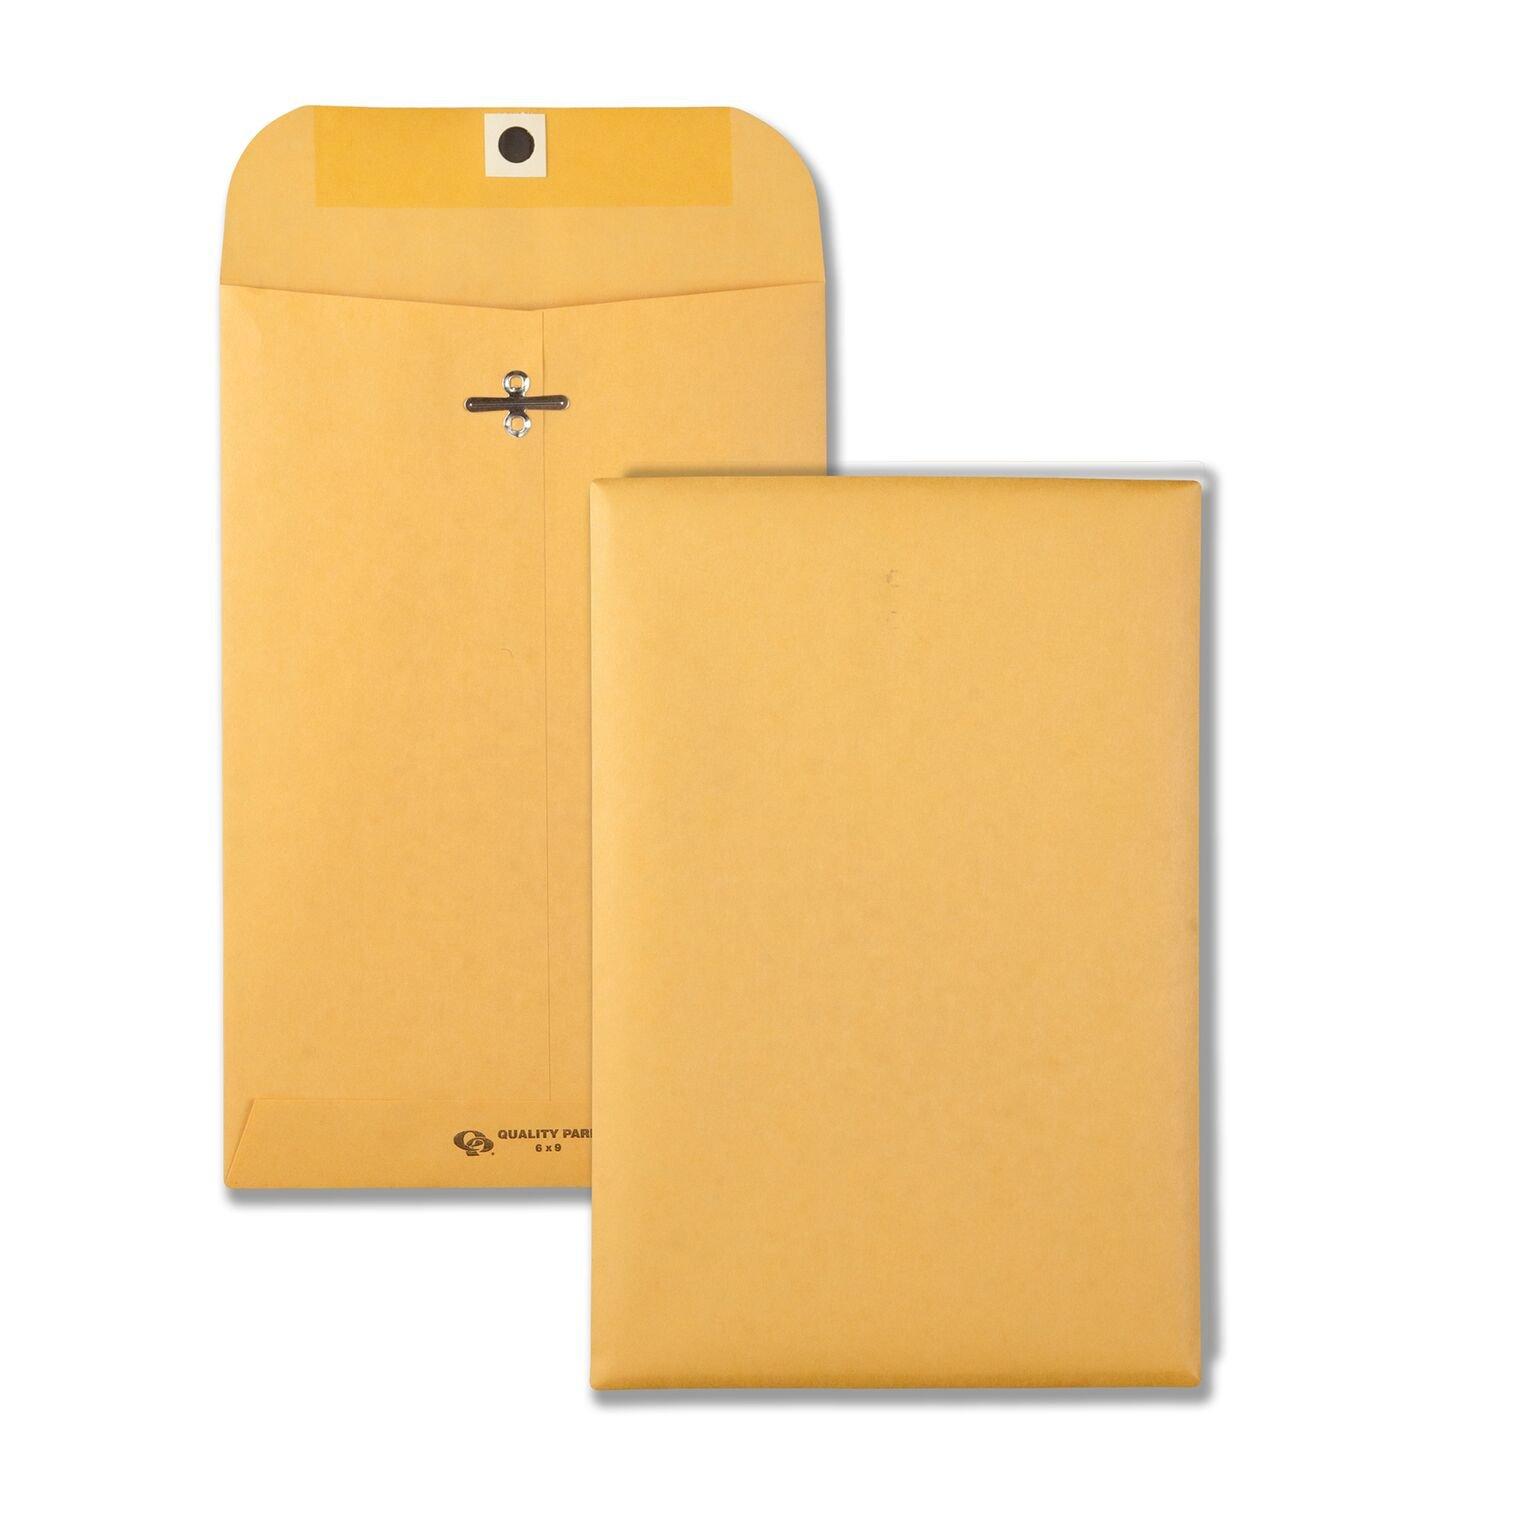 Quality Park 37894 Quality Park Clasp Envelopes, 9-1/4x14-1/2, 28lb, Brown Kraft, 100/Box by Quality Park